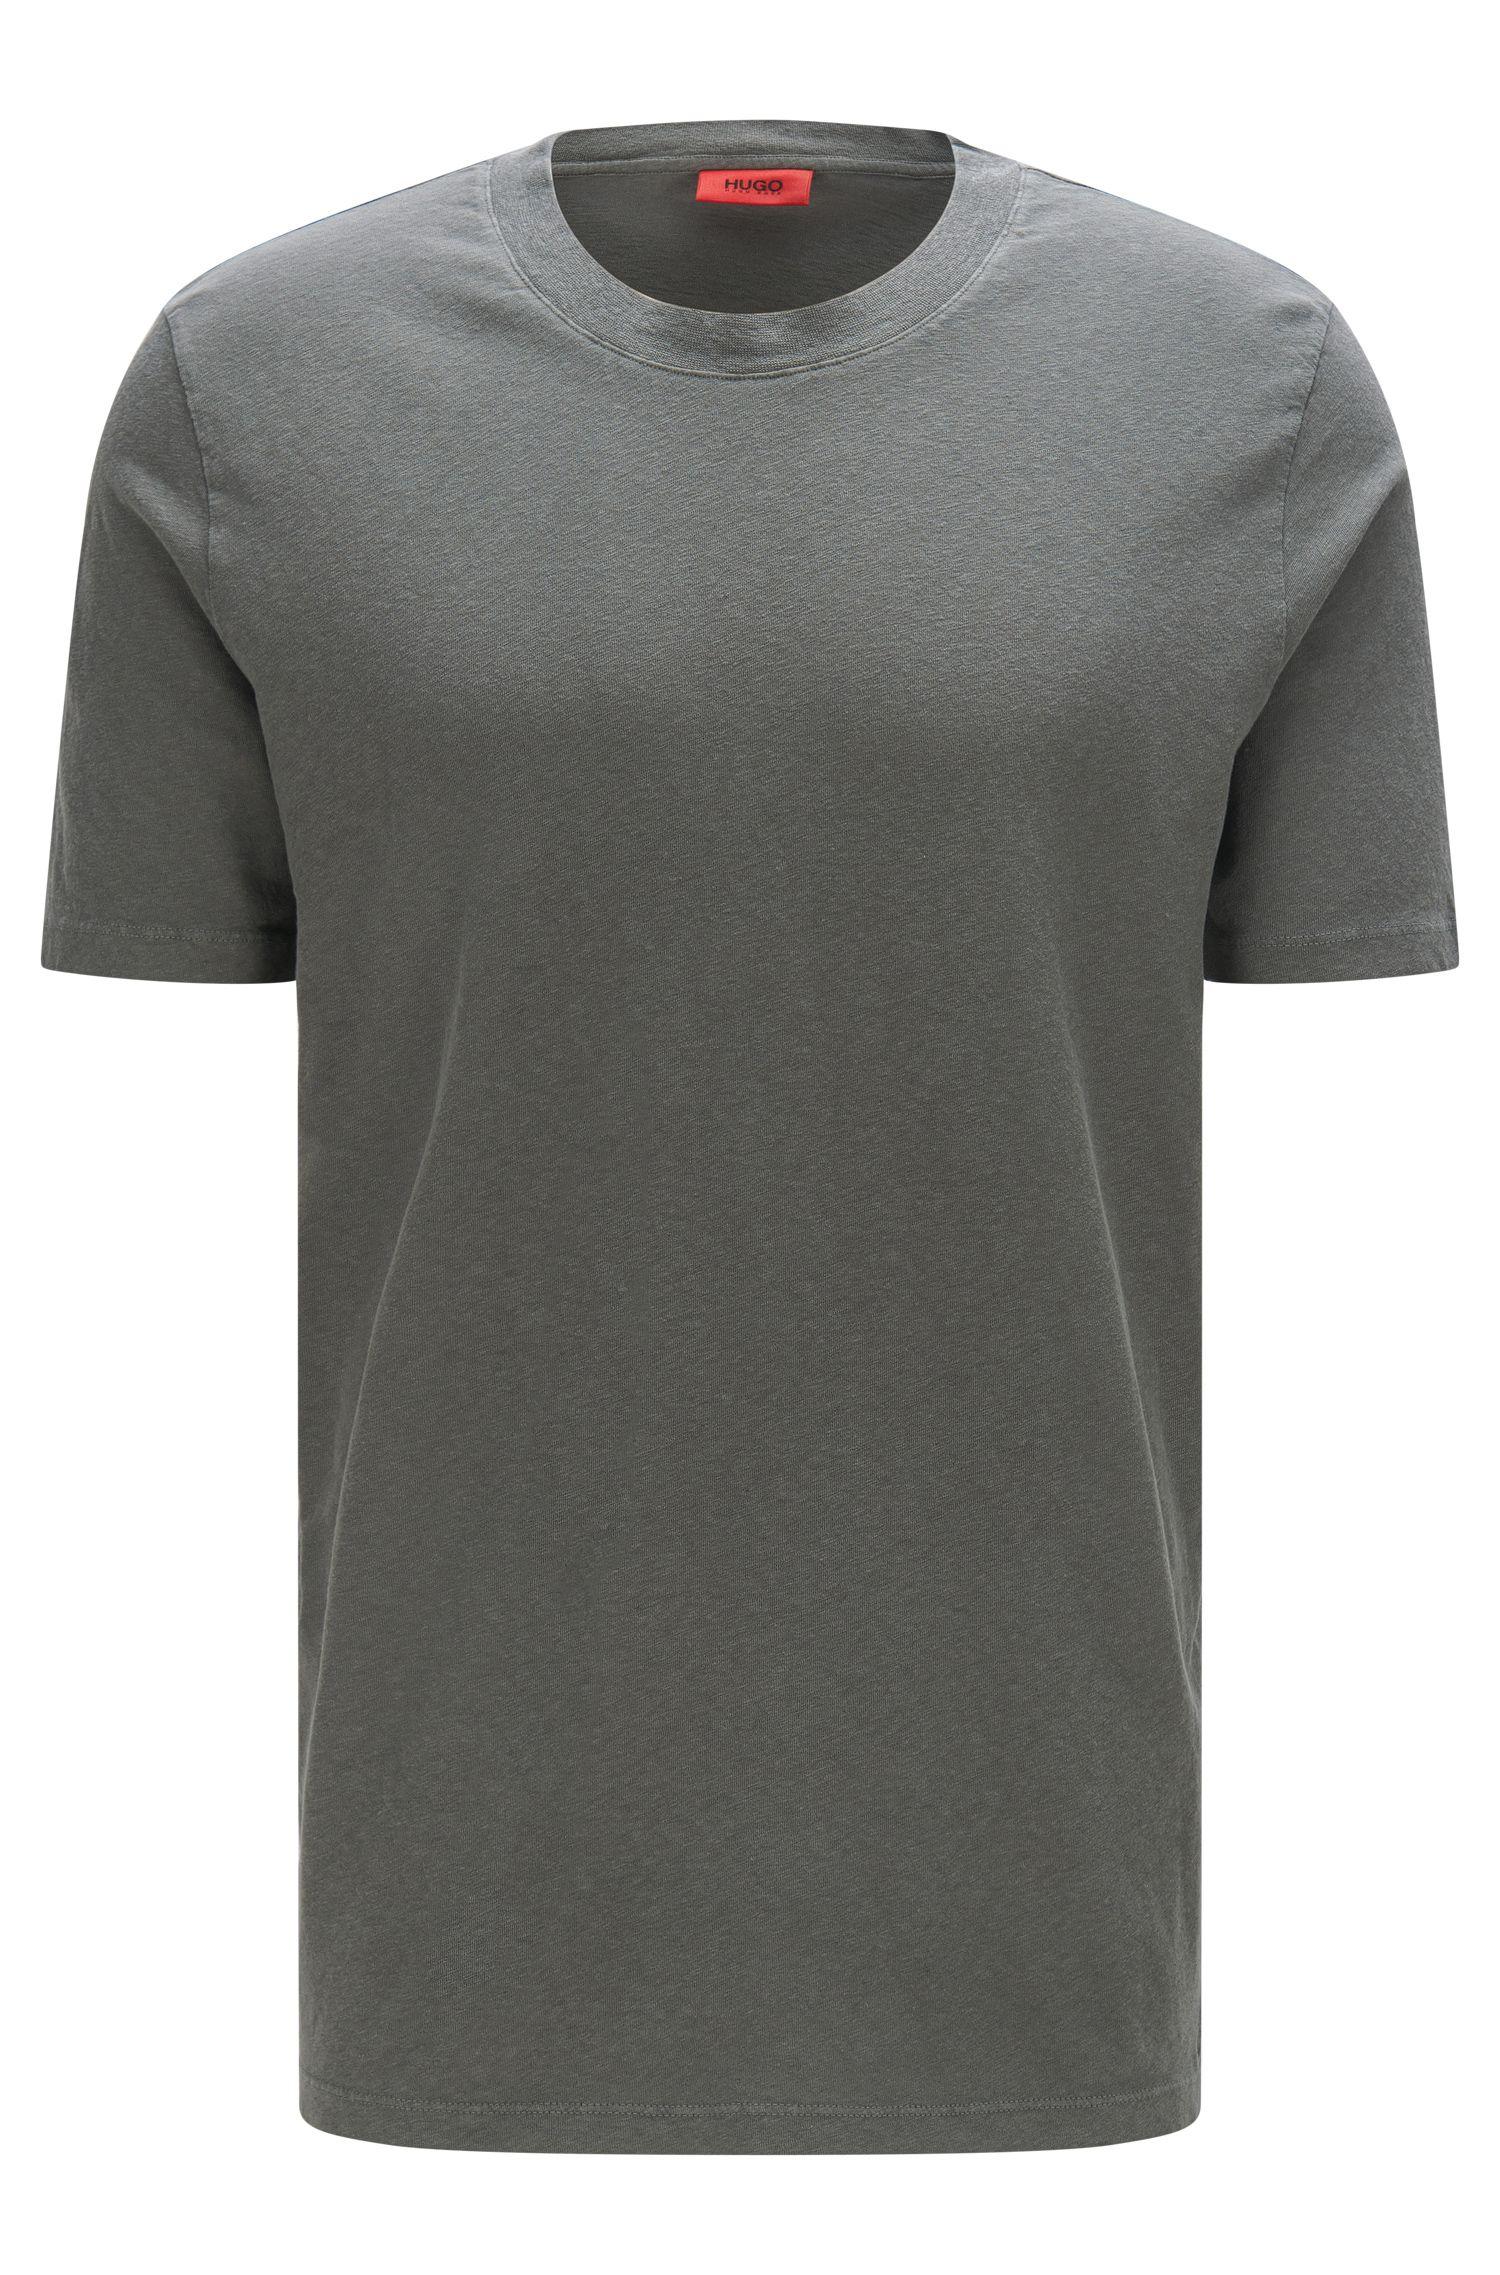 Relaxed-Fit T-Shirt aus Baumwoll-Mix mit Leinen: 'Dremont'